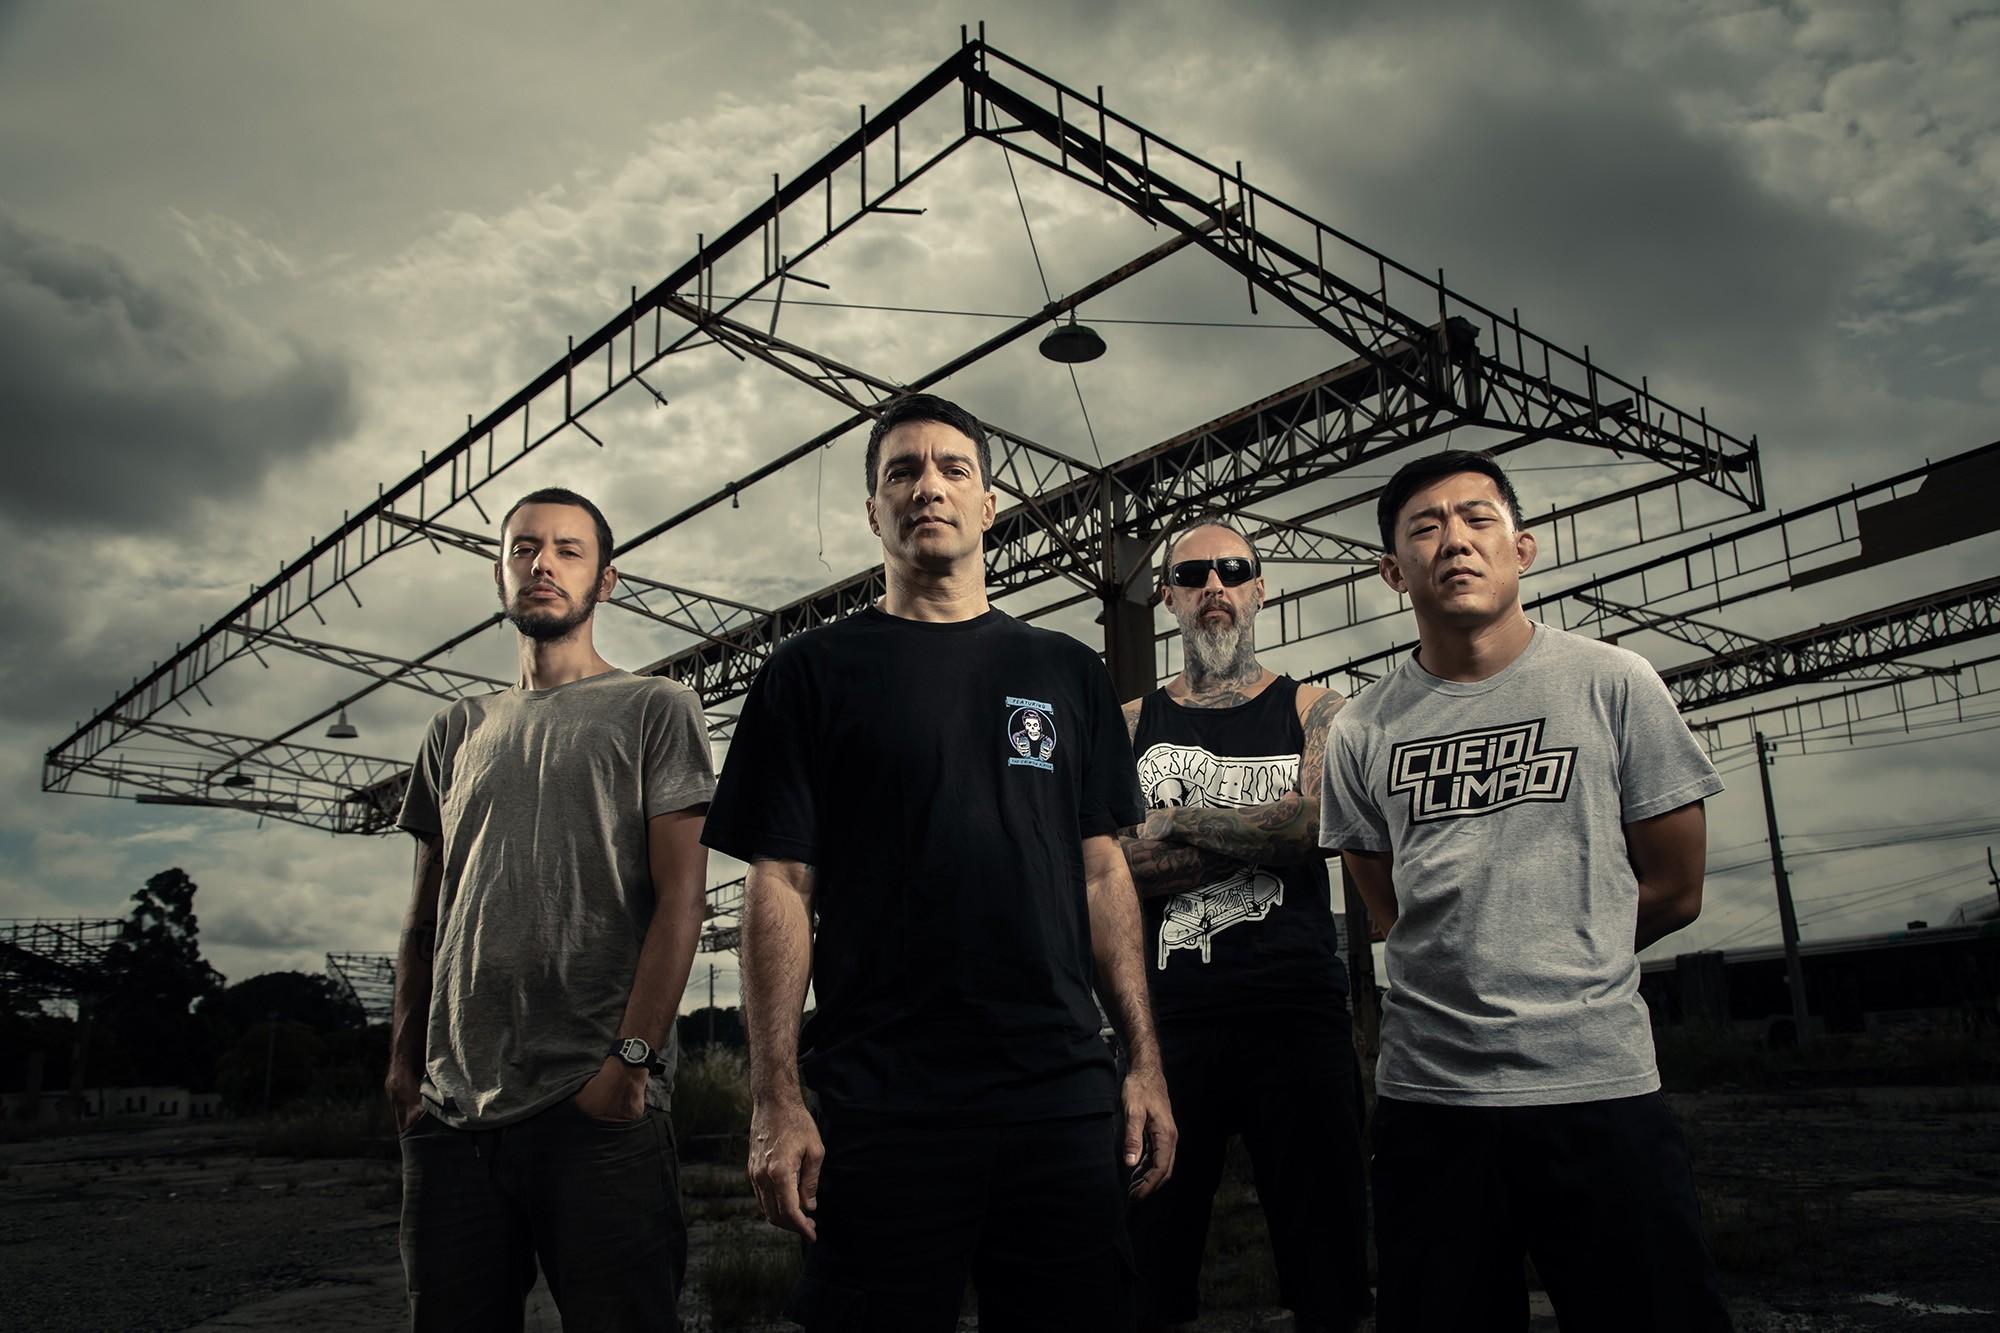 Dead Fish compila raridades da discografia da banda no álbum 'Lado bets'